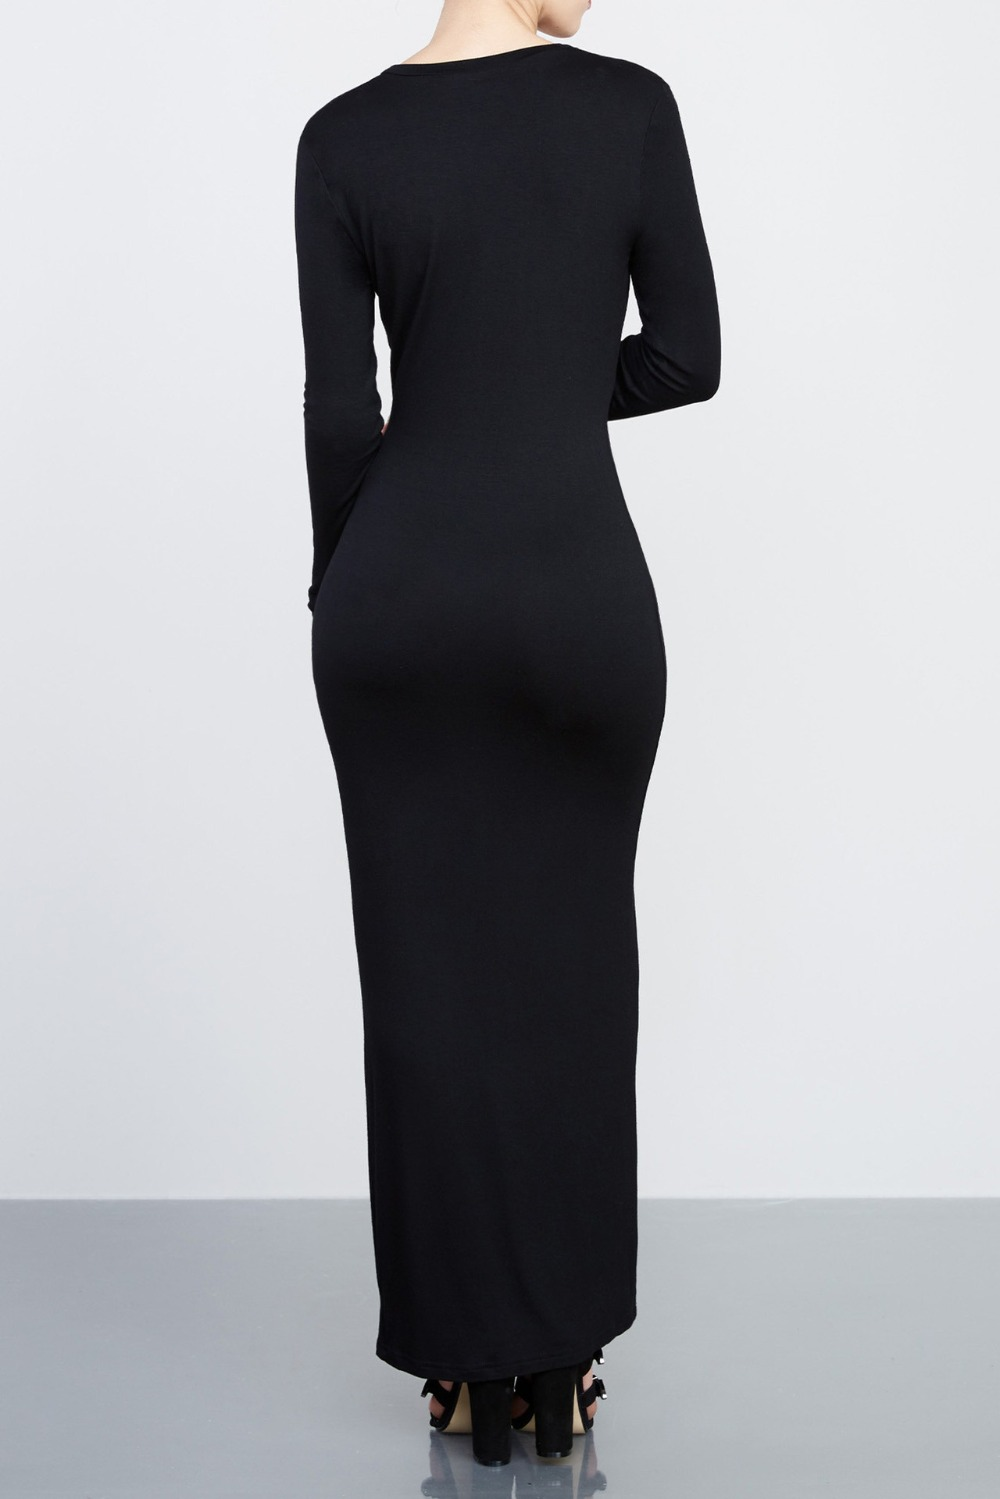 Spring Autumn button women maxi cardigan black fashion casual sexy ...